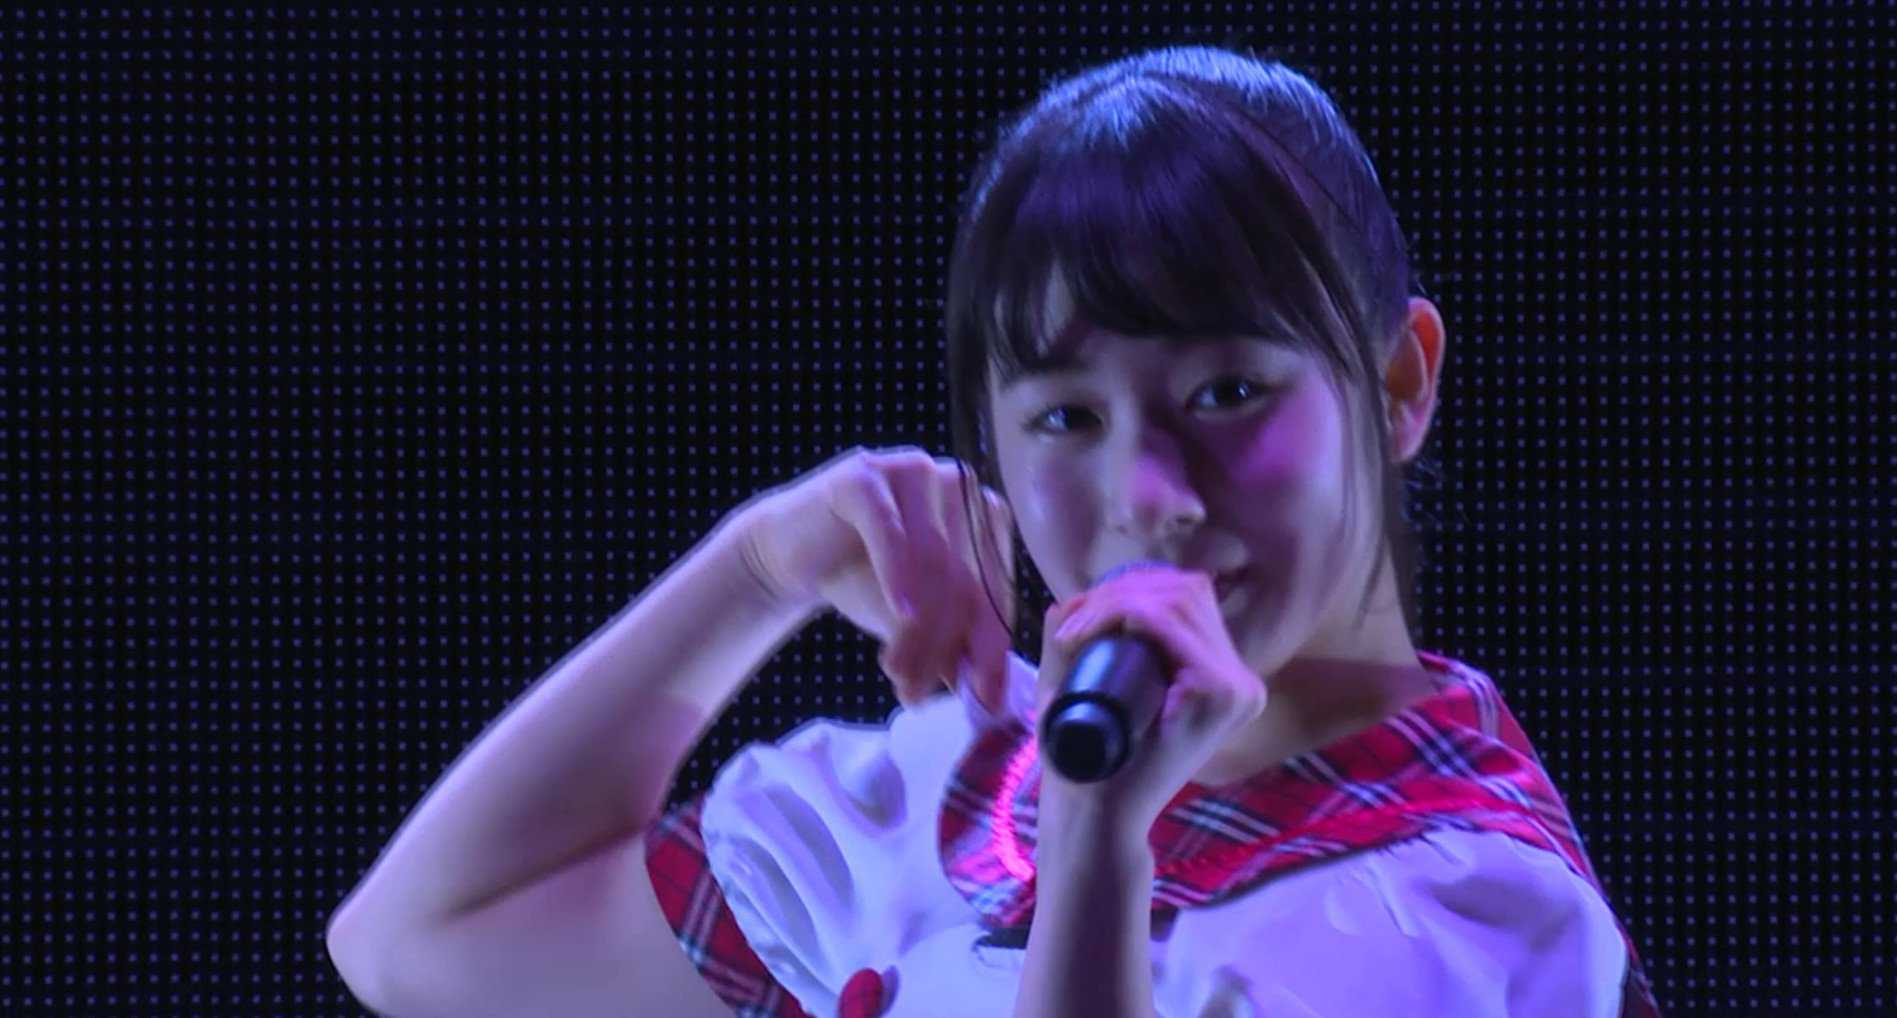 NGT48 Skirt Hirari スカート、ひらり -001